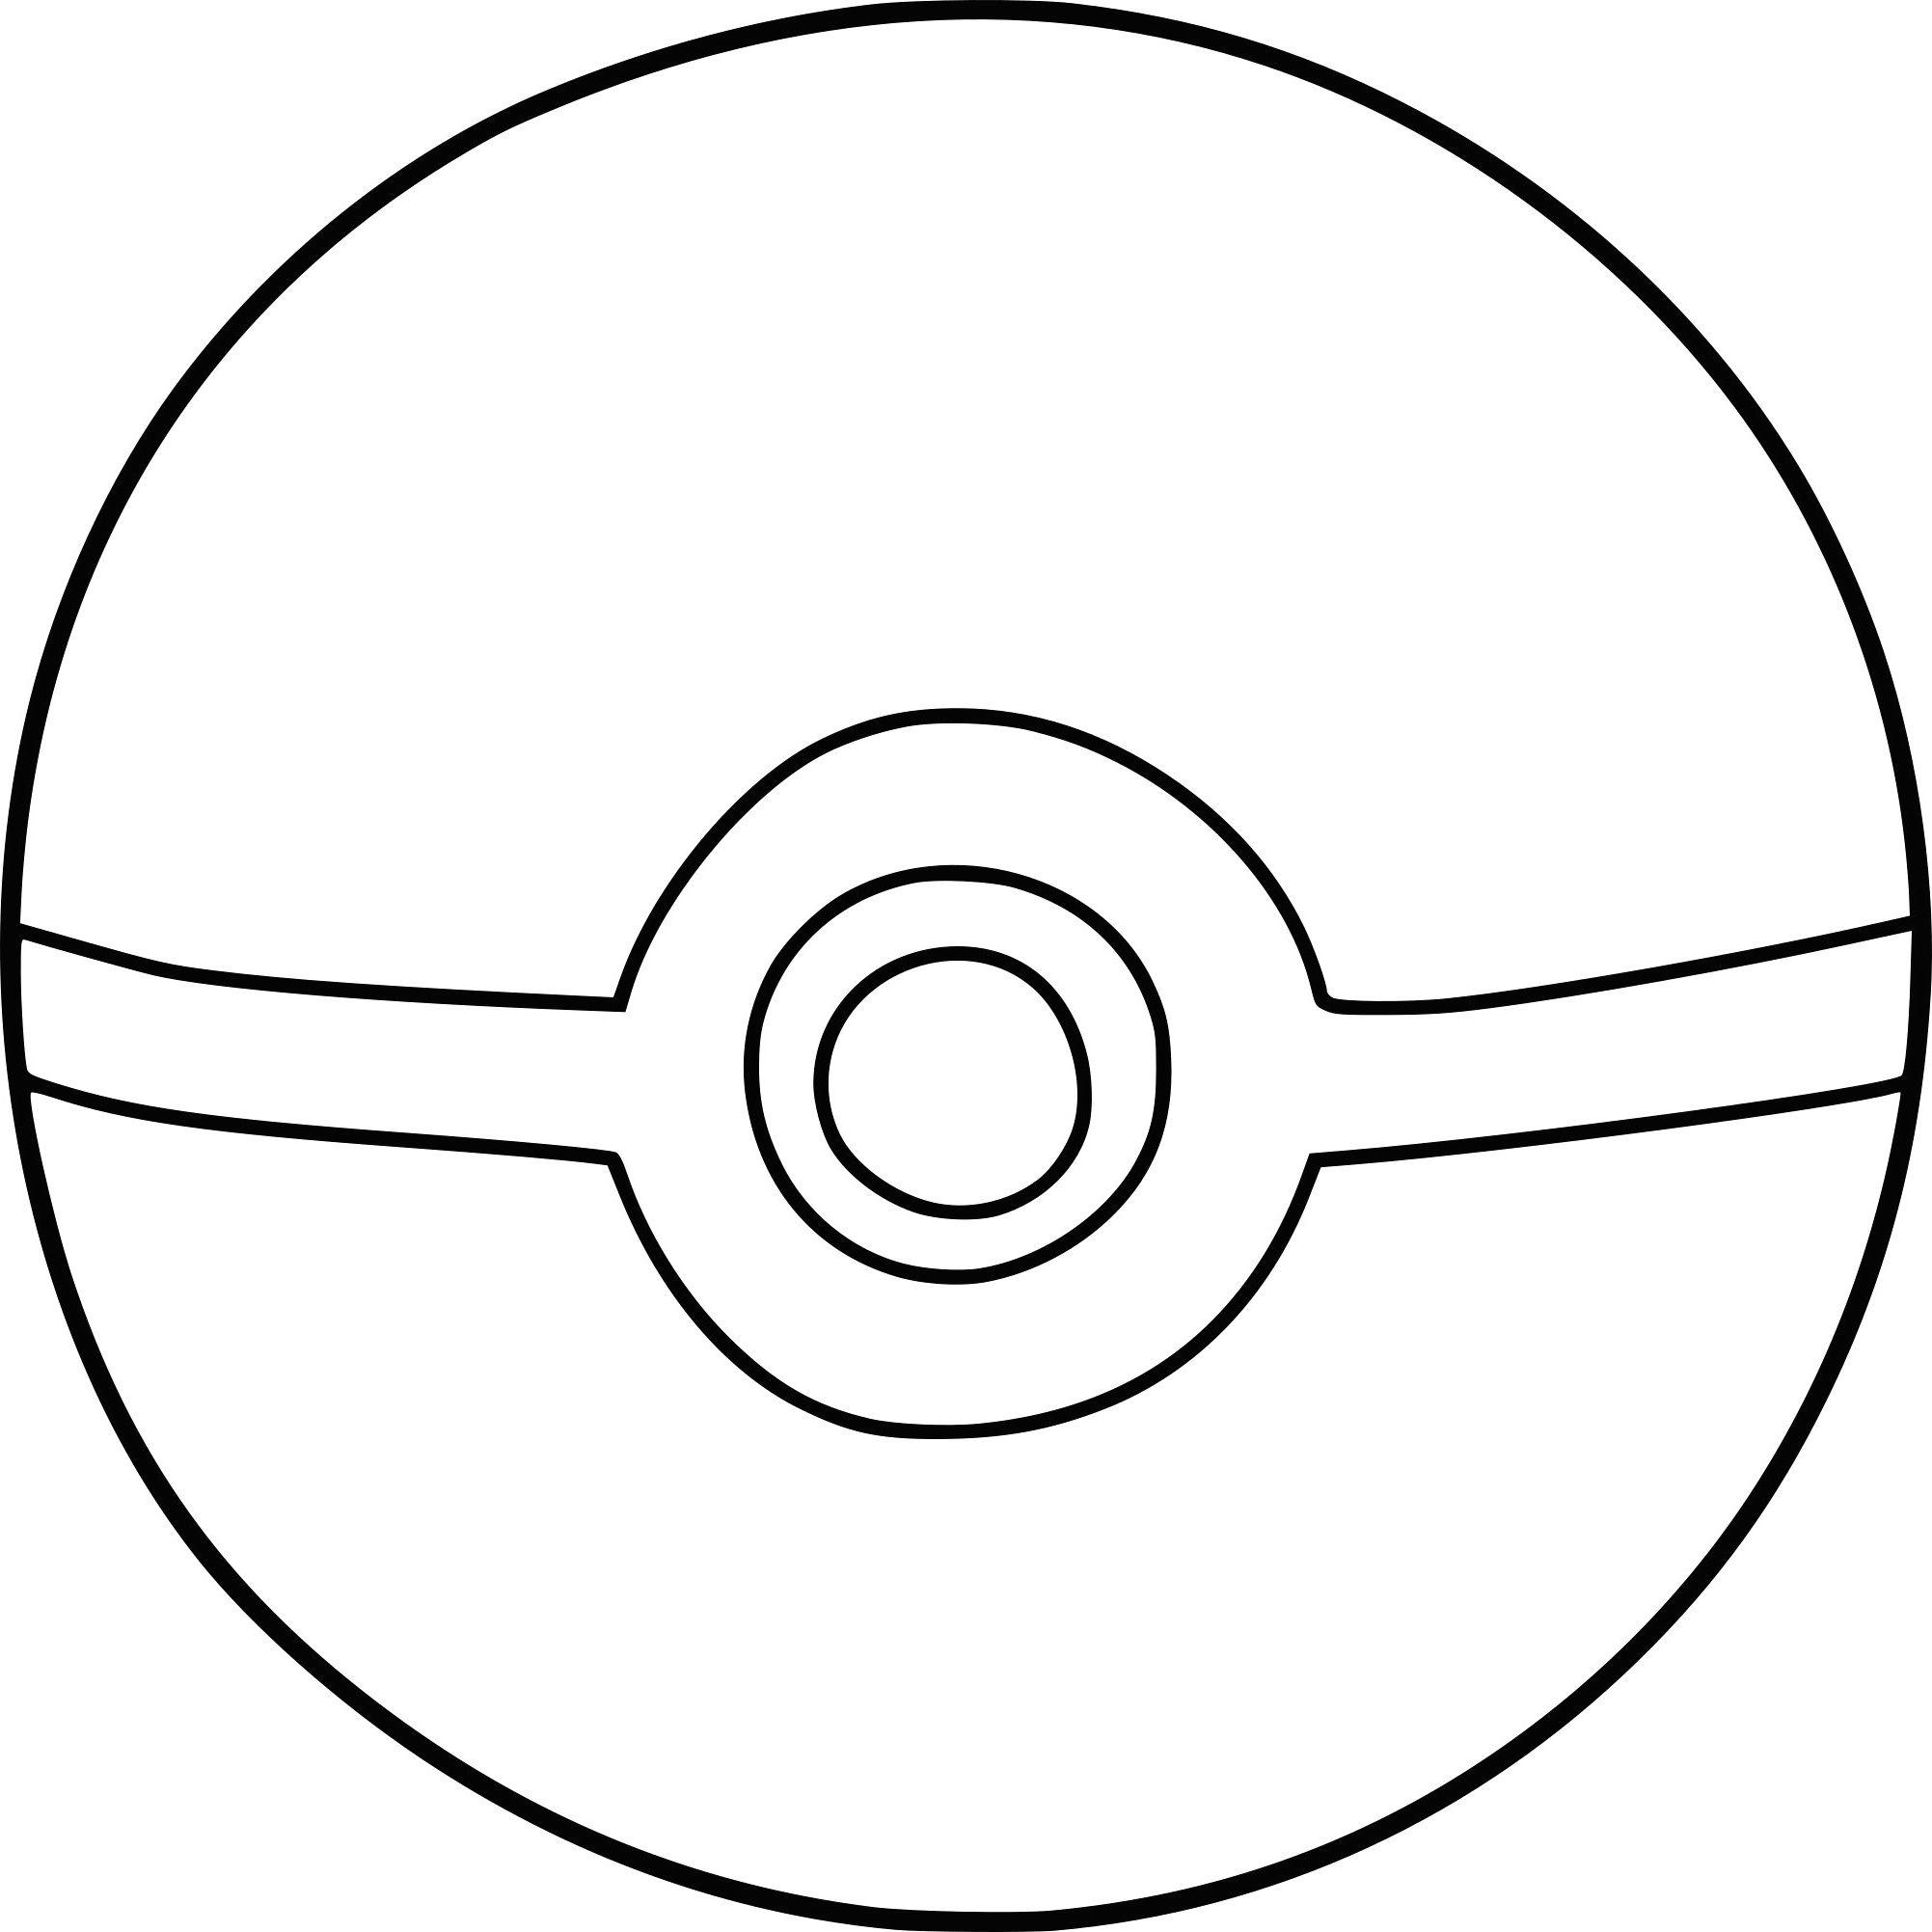 14 Meilleur De Coloriage Pokeball Galerie Pokemon Ball Pokemon Coloring Pokemon Coloring Pages